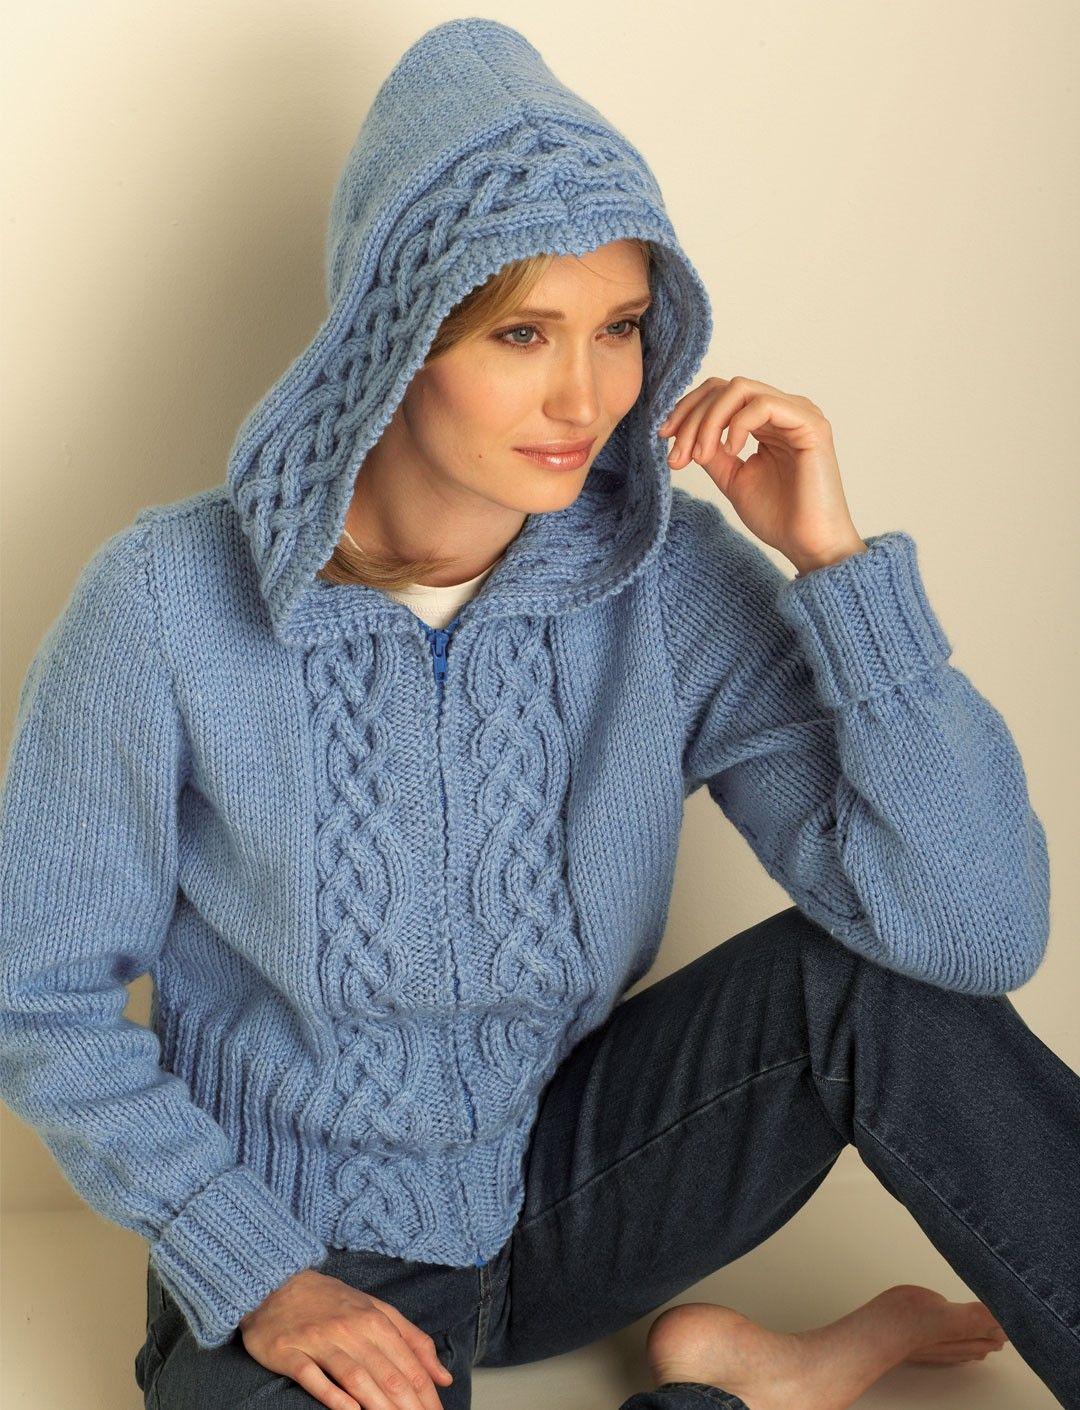 Yarnspirations.com - Bernat Cozy Cable Hooded Cardigan - Patterns ...